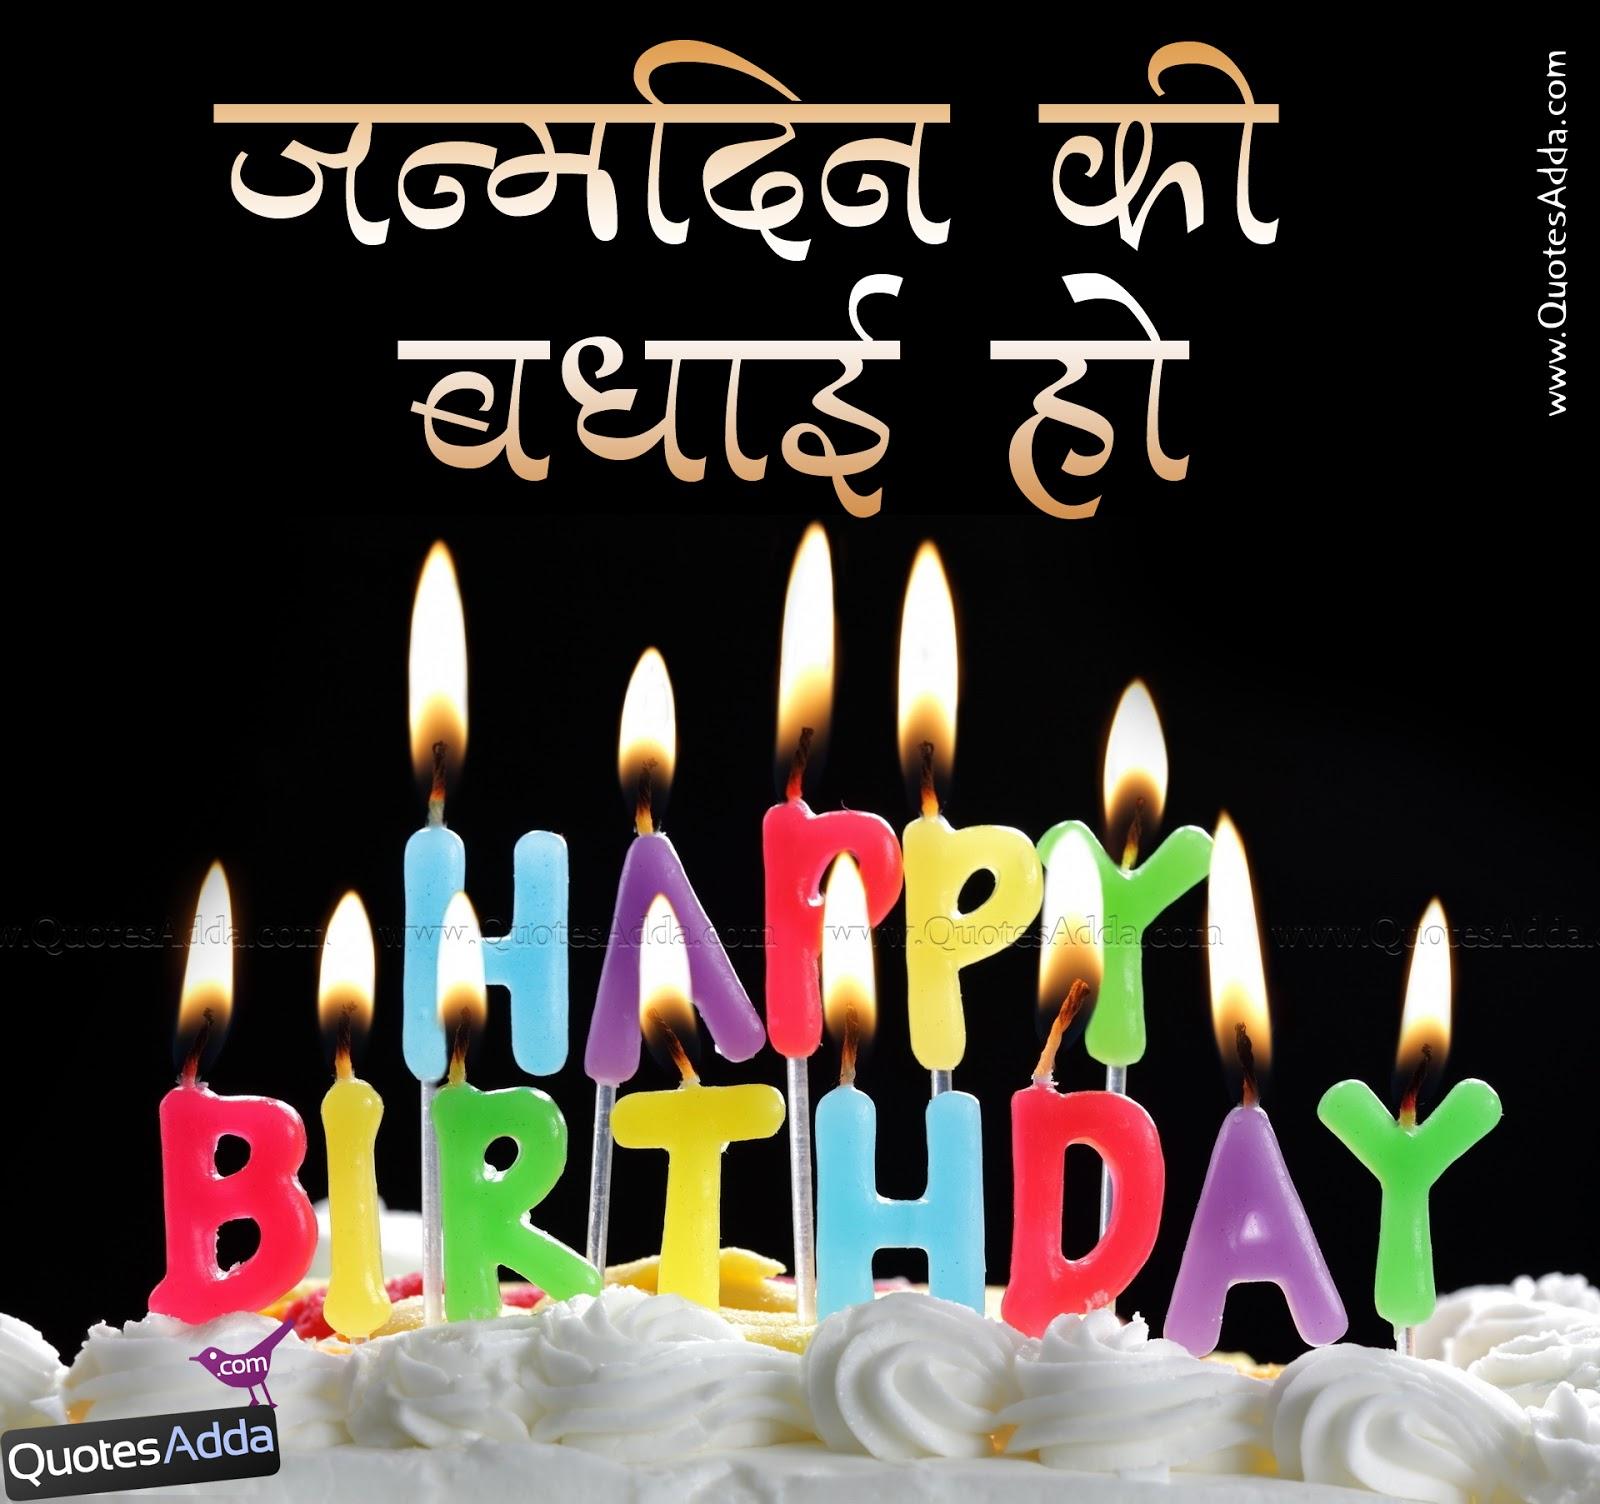 Happy Birthday Mom Quotes From Son In Hindi: Hindi Birthday Quotes